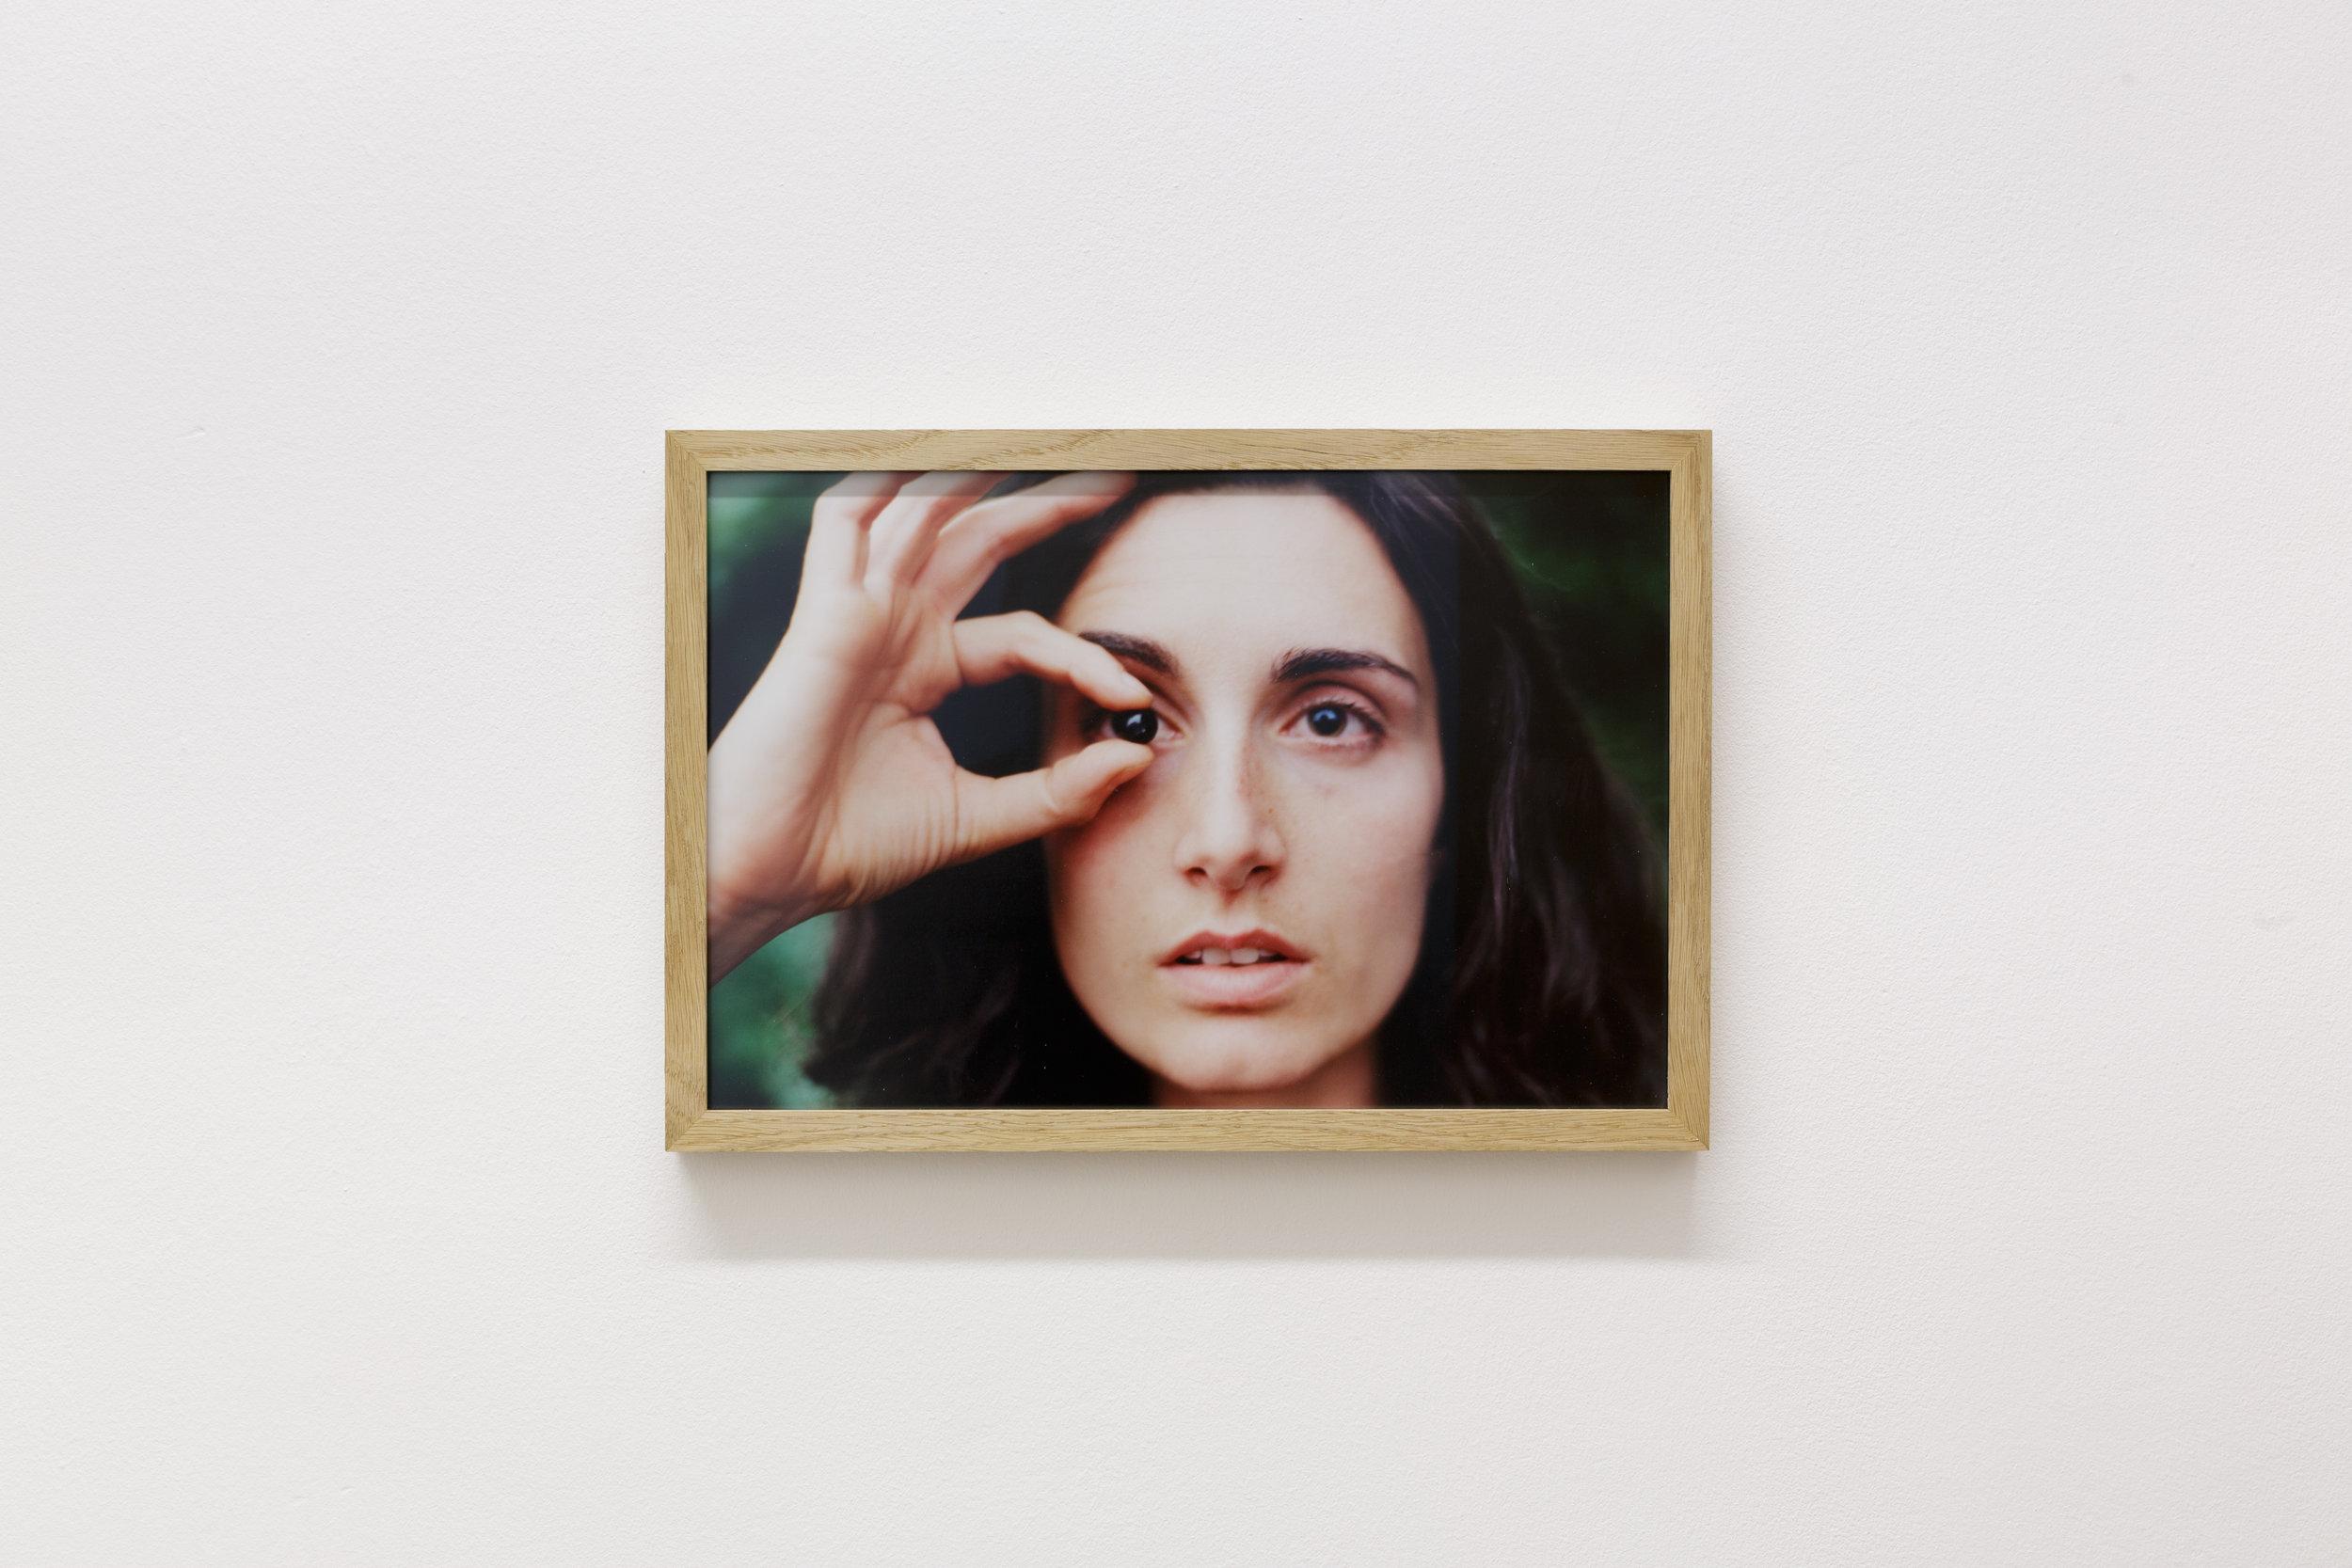 Gaia Fugazza, Atropa Belladonna, 2017. Photographic print by David Bebber. Photo: Tim Bowditch.